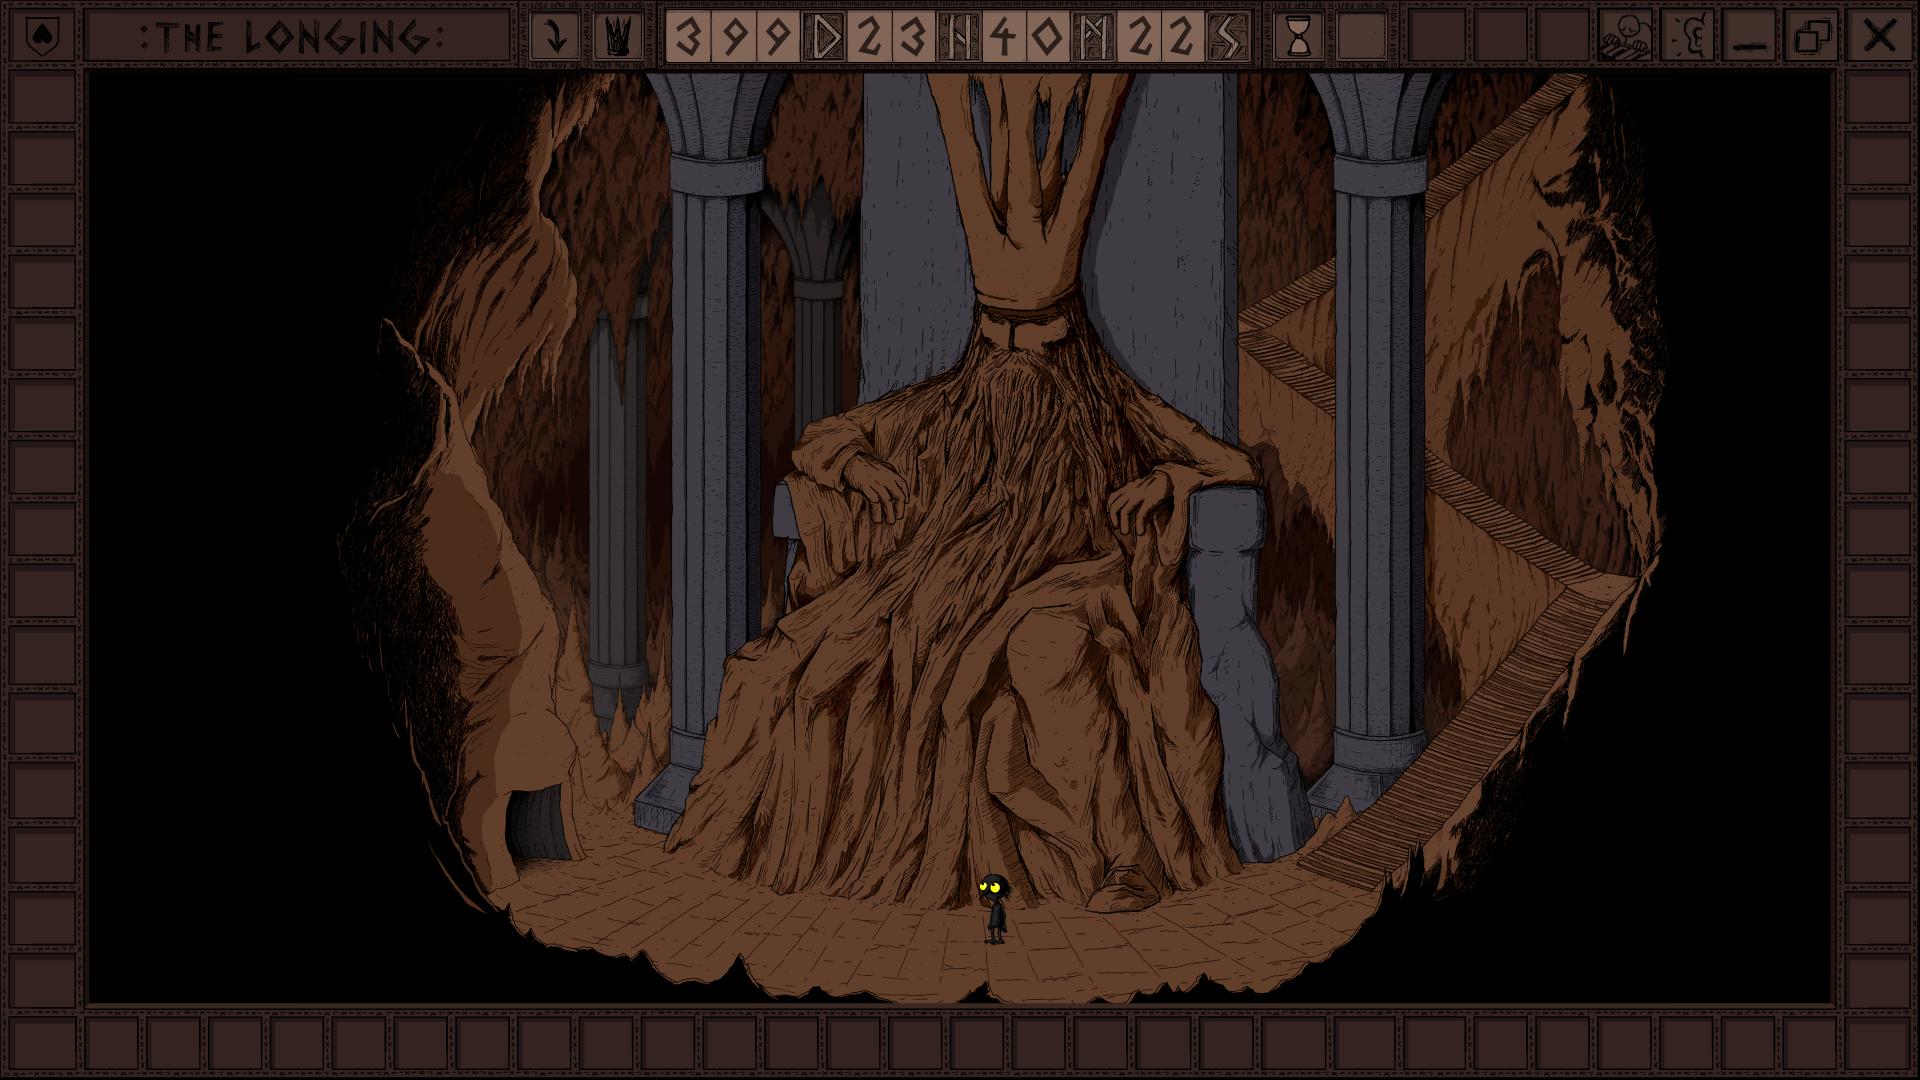 Screenshot von The Longing